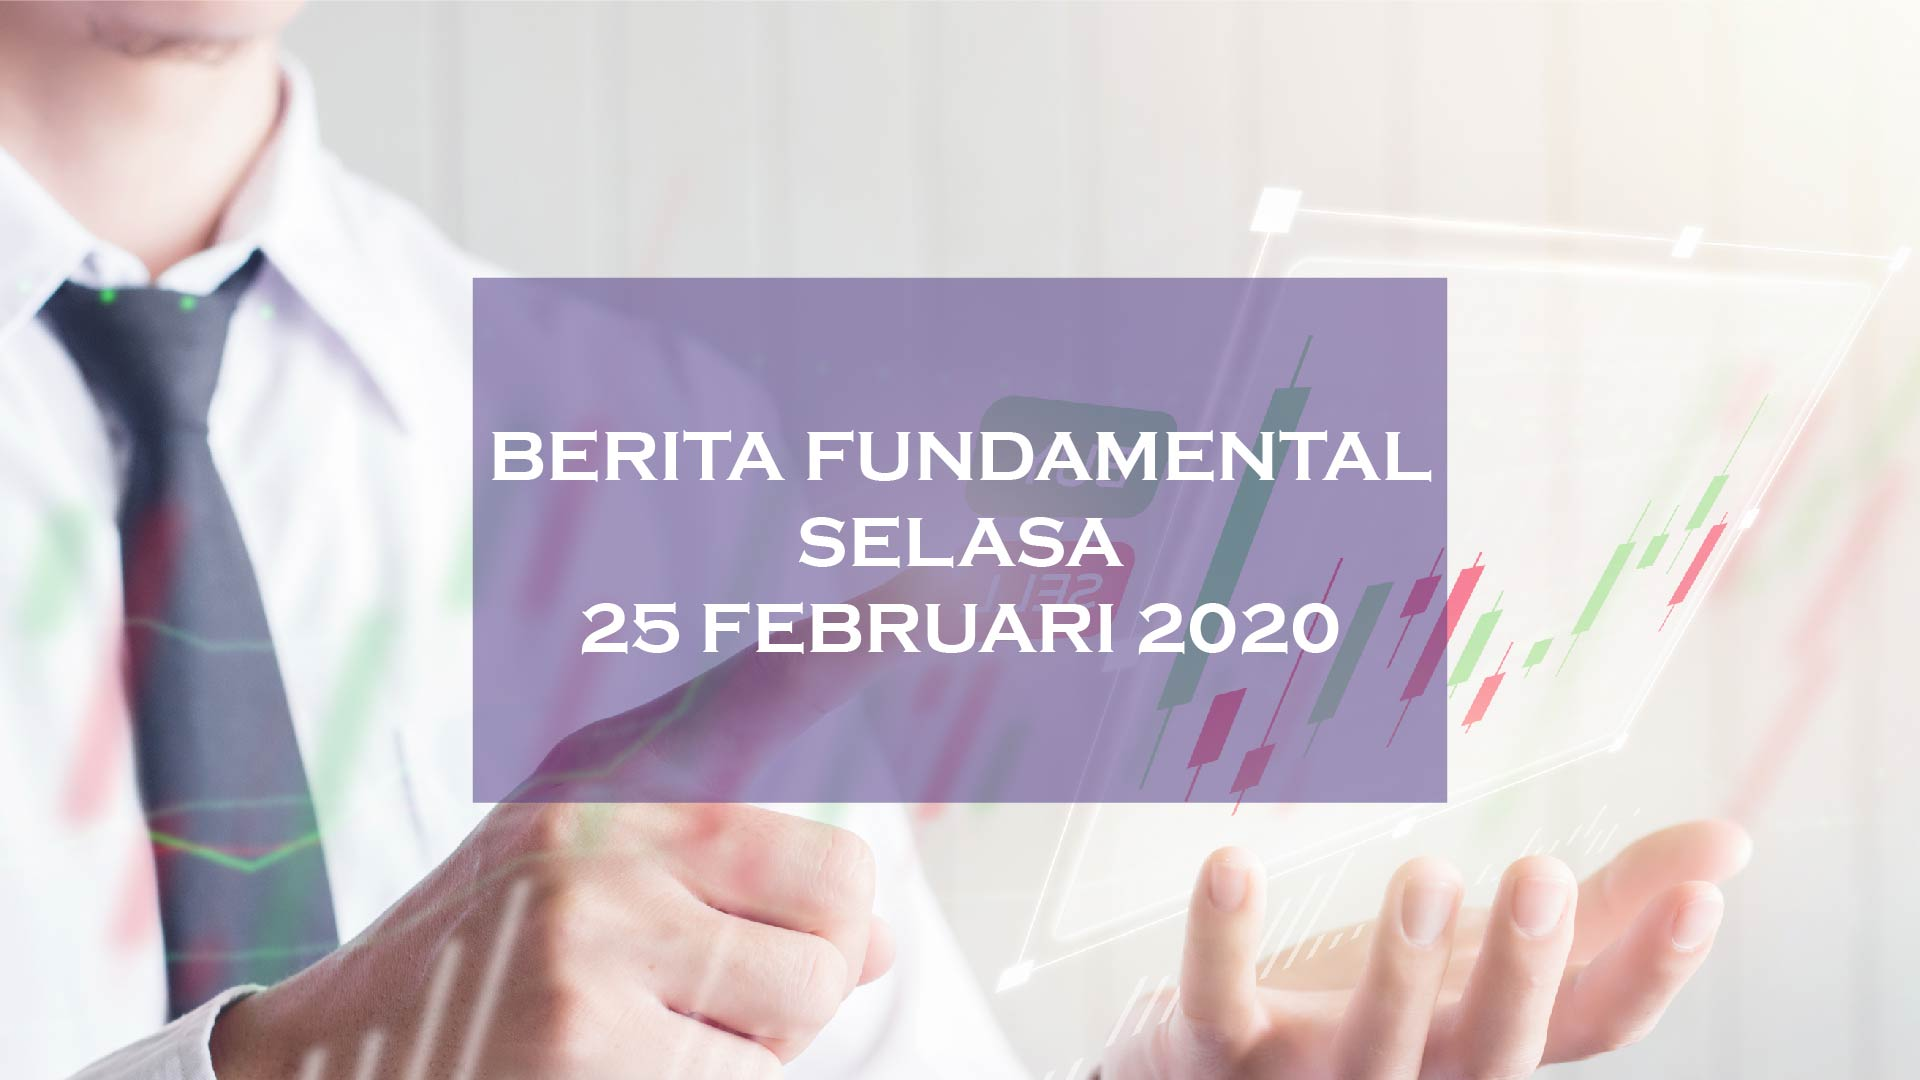 berita fundamental hsb investasi 25 feb 2020